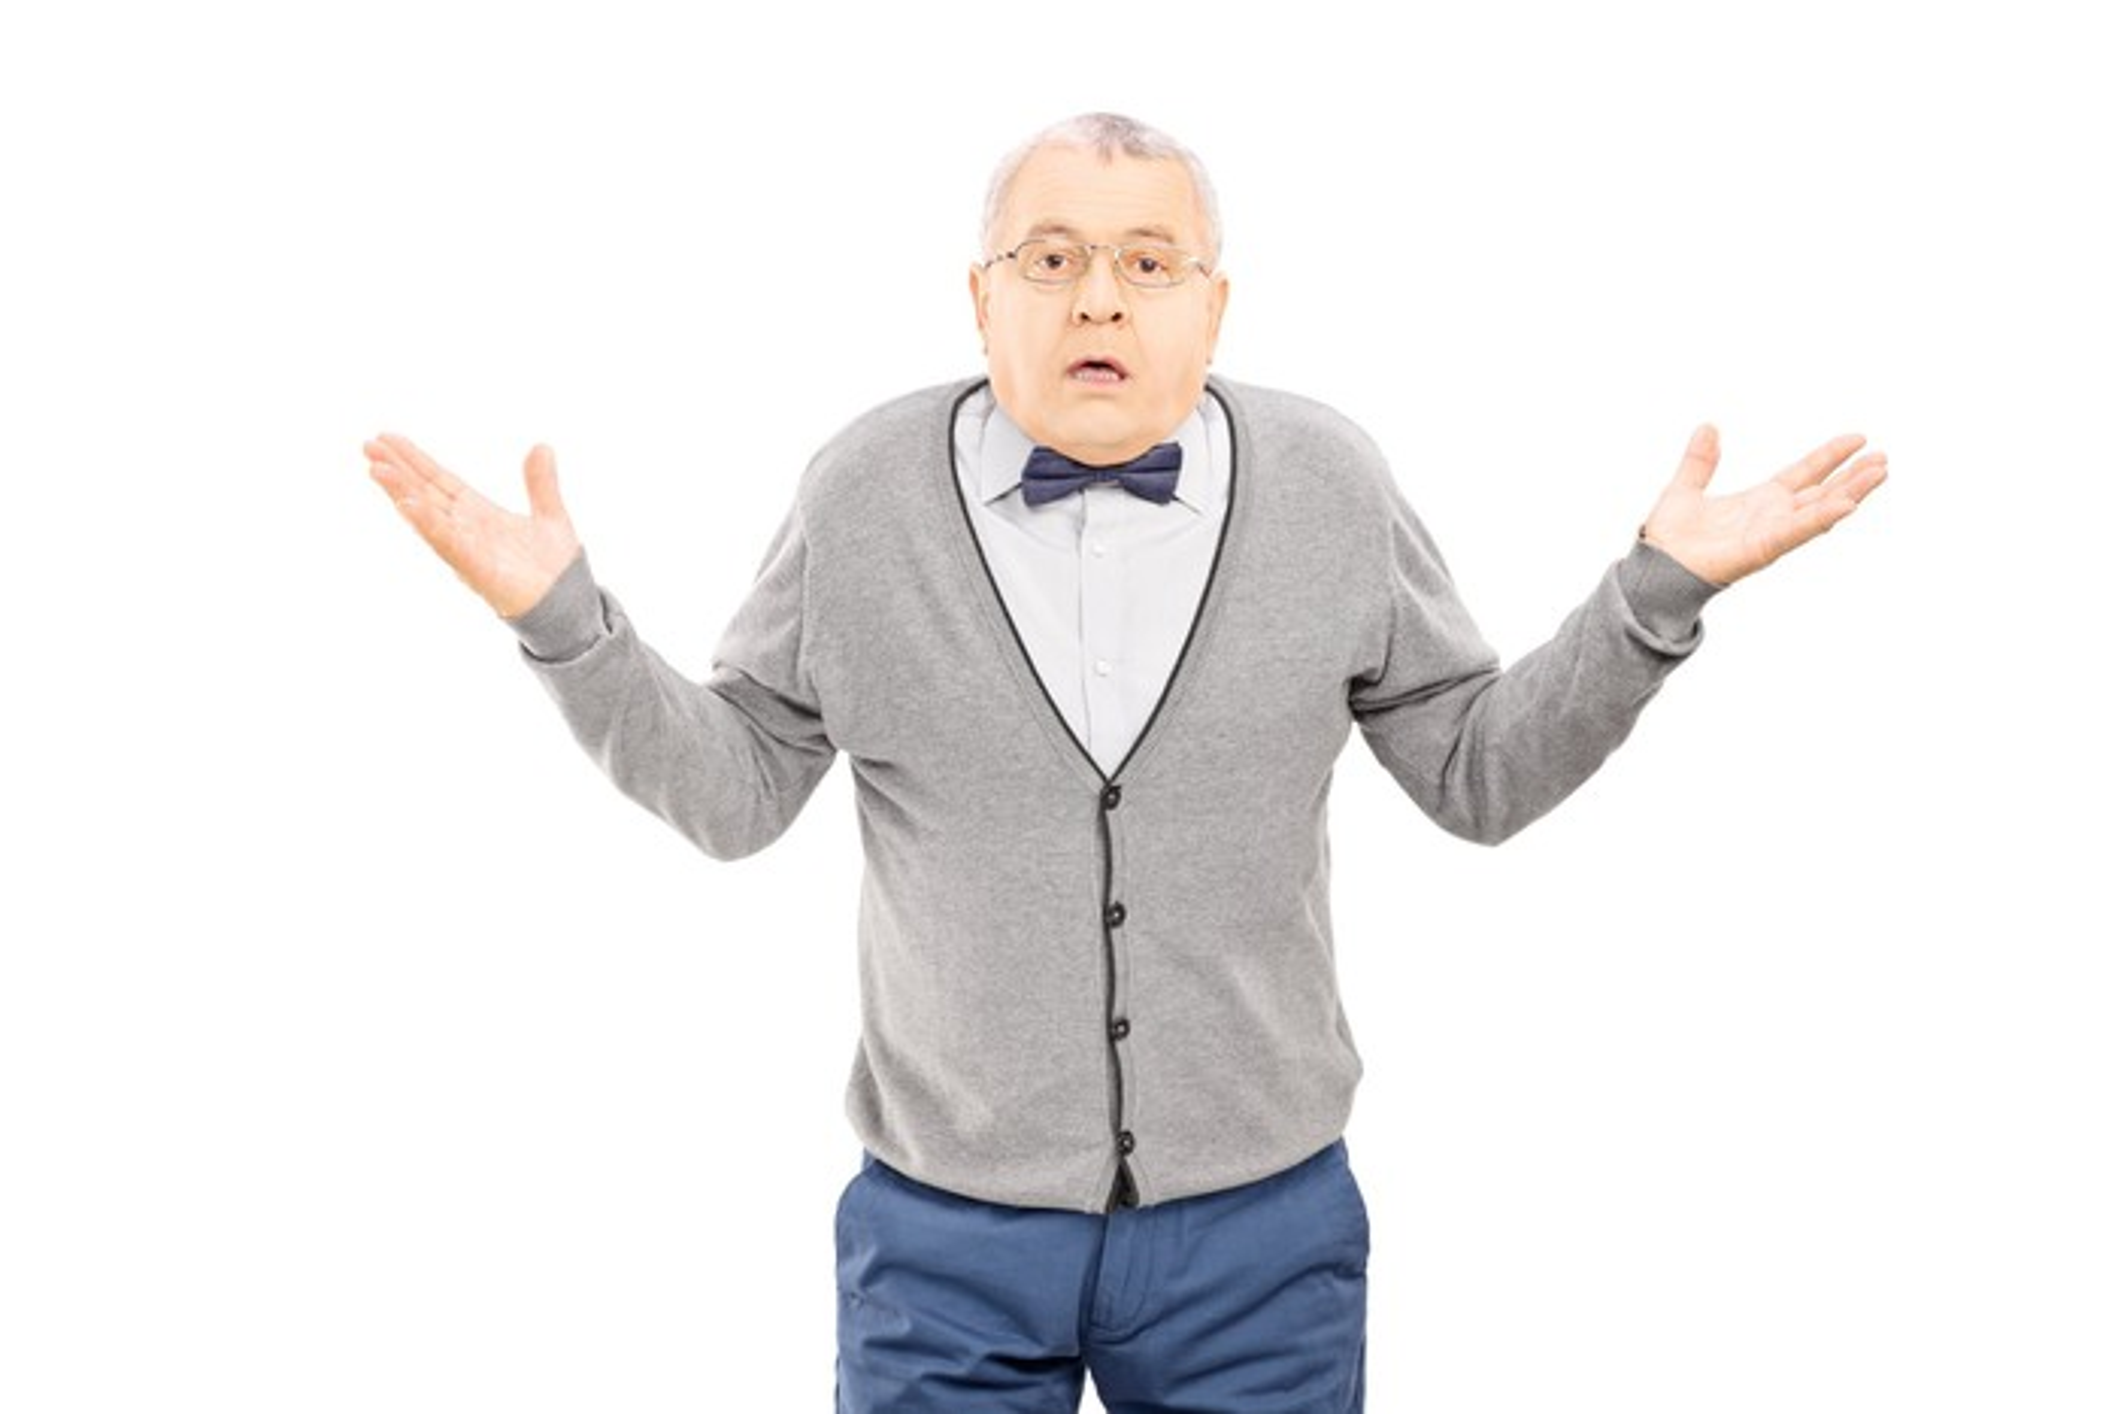 An elderly man shrugging his shoulders